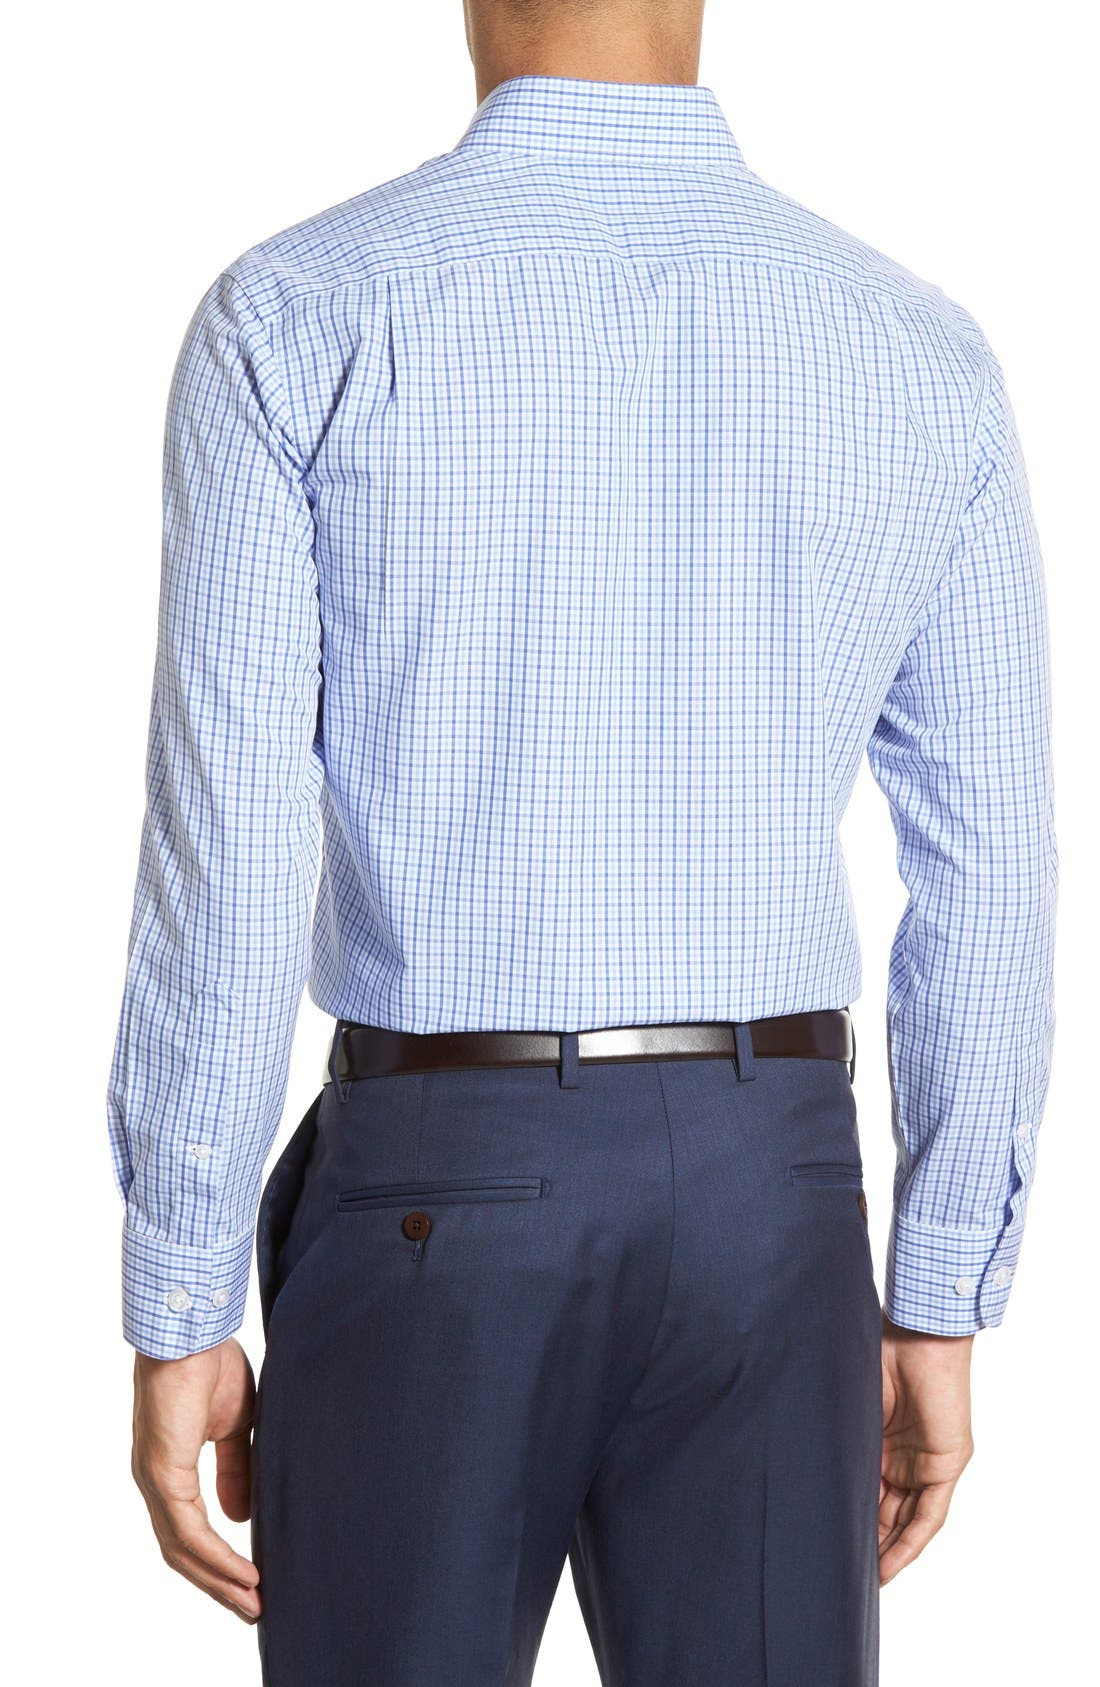 Slim Fit Wrinkle Free Check Dress Shirt,                             Alternate thumbnail 2, color,                             Pale Blue